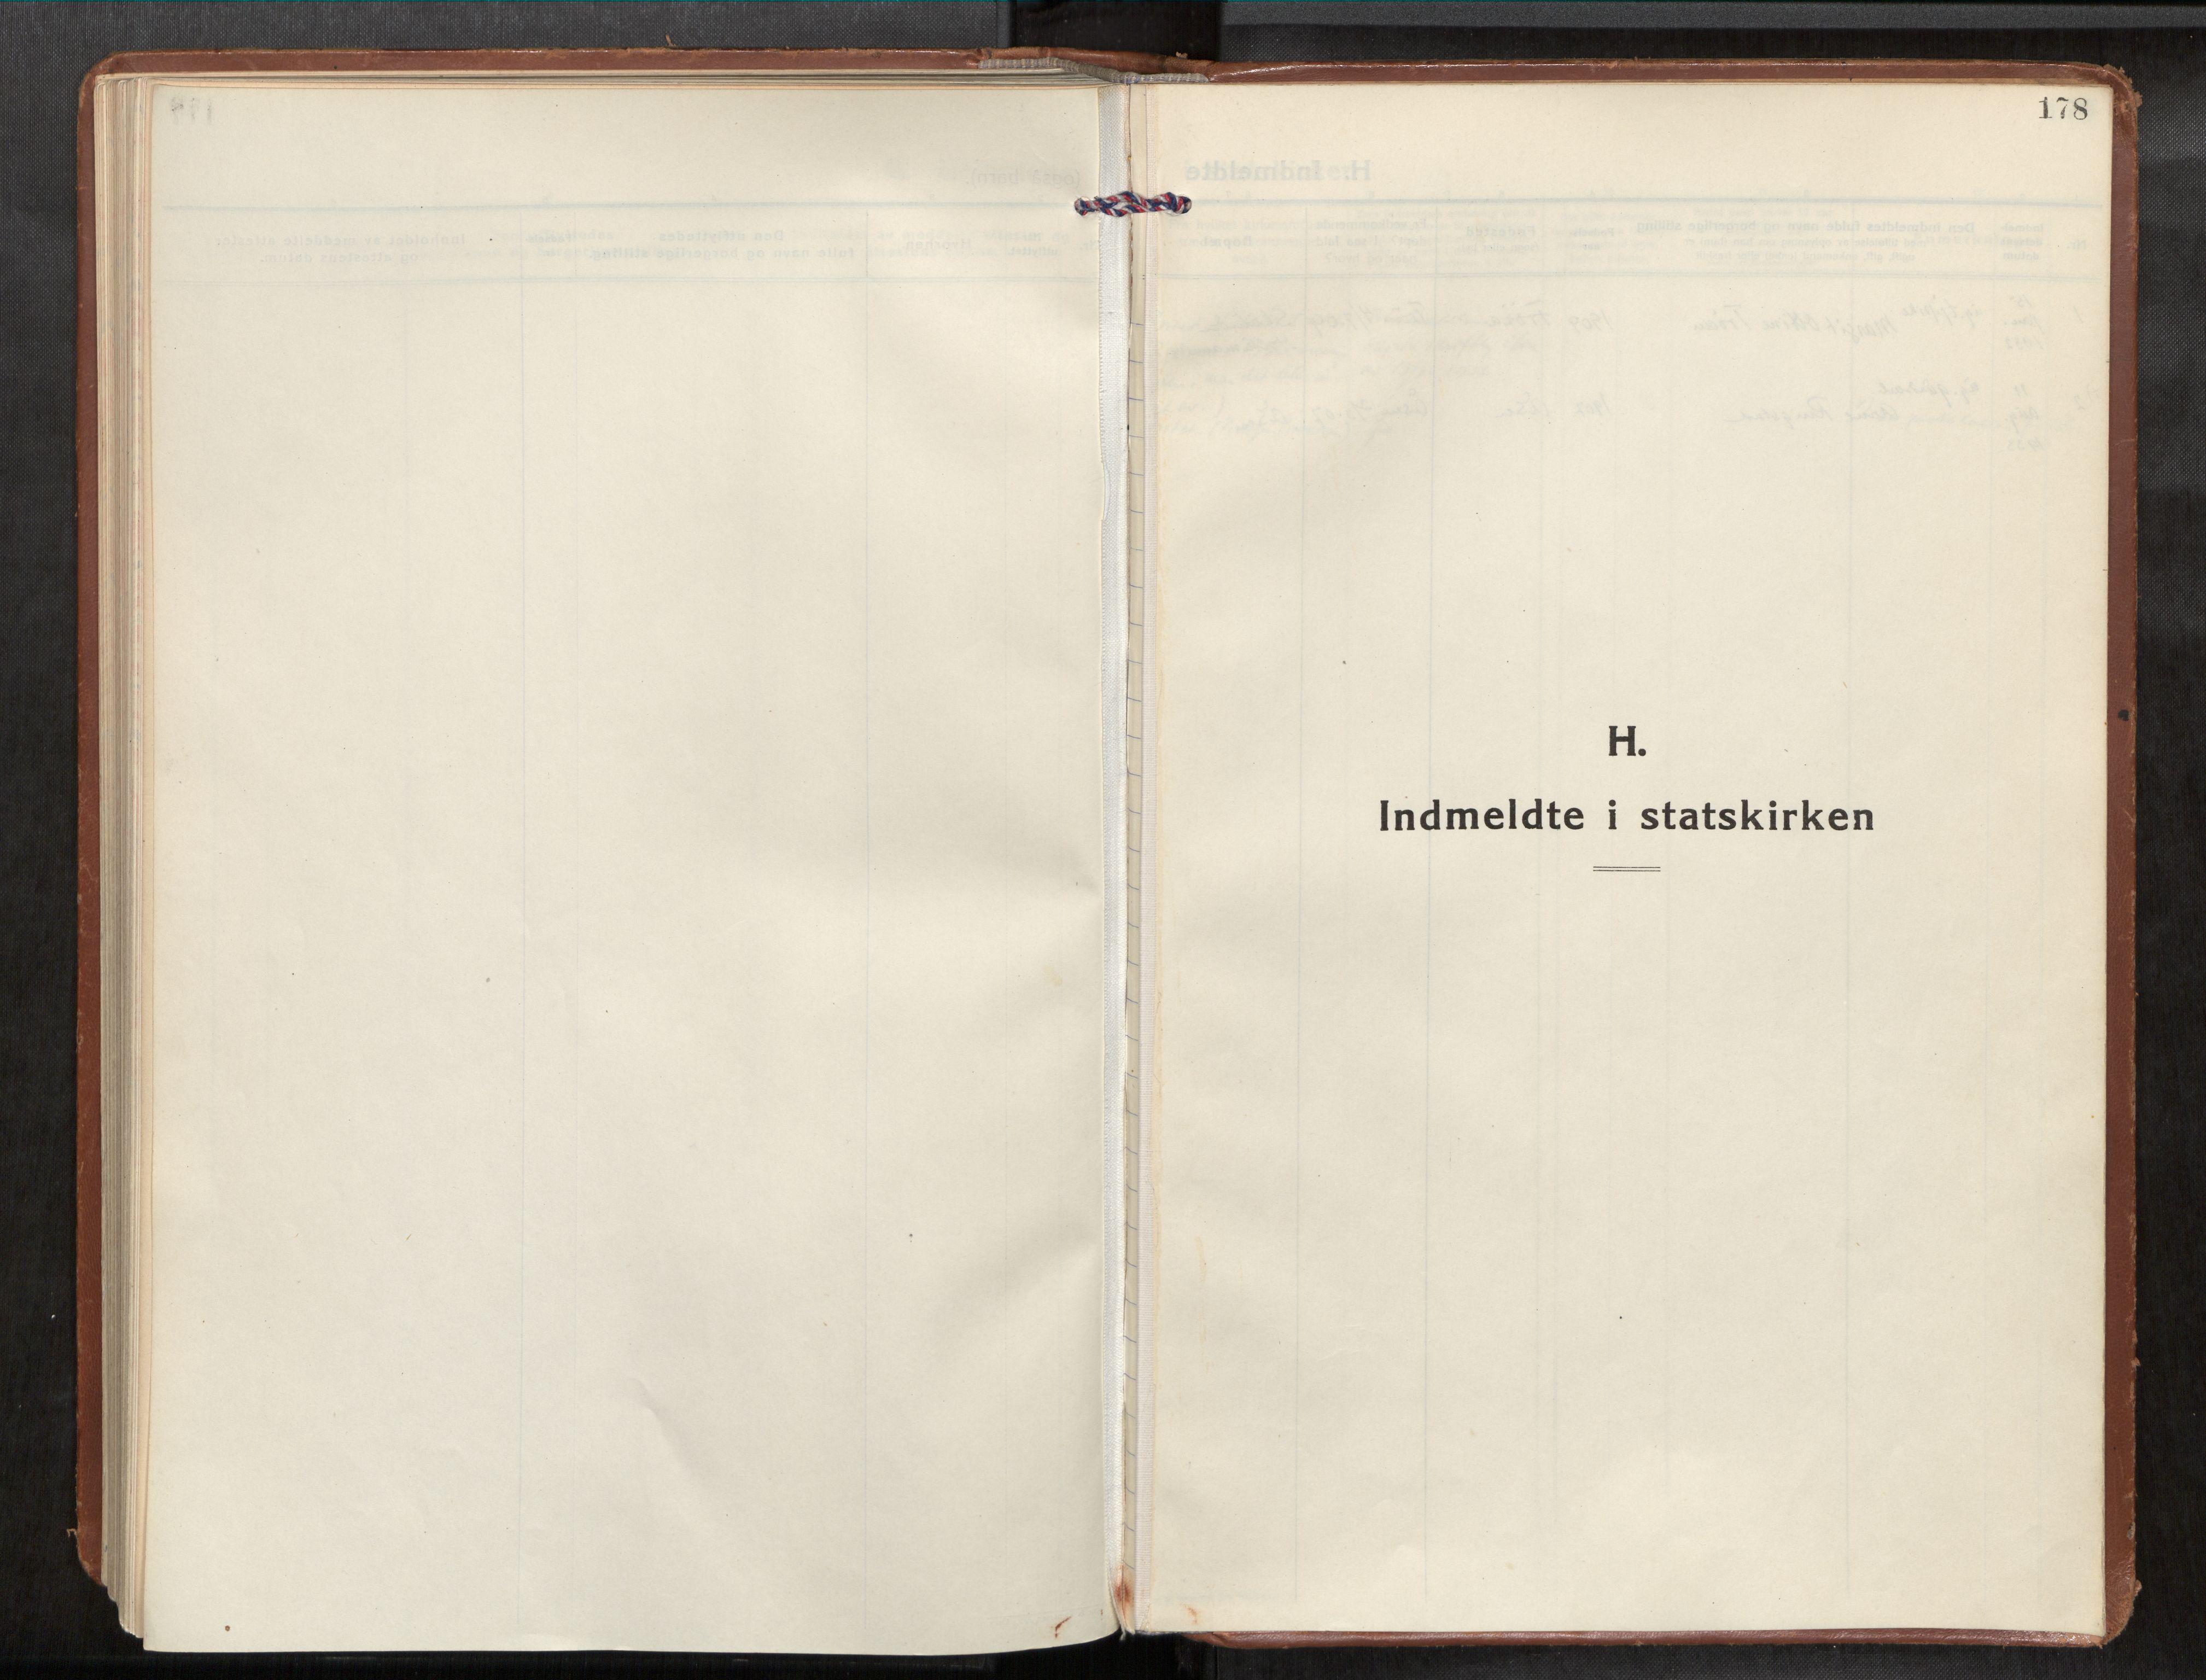 SAT, Frosta sokneprestkontor, H/Haa/L0001: Ministerialbok nr. 1, 1926-1934, s. 178